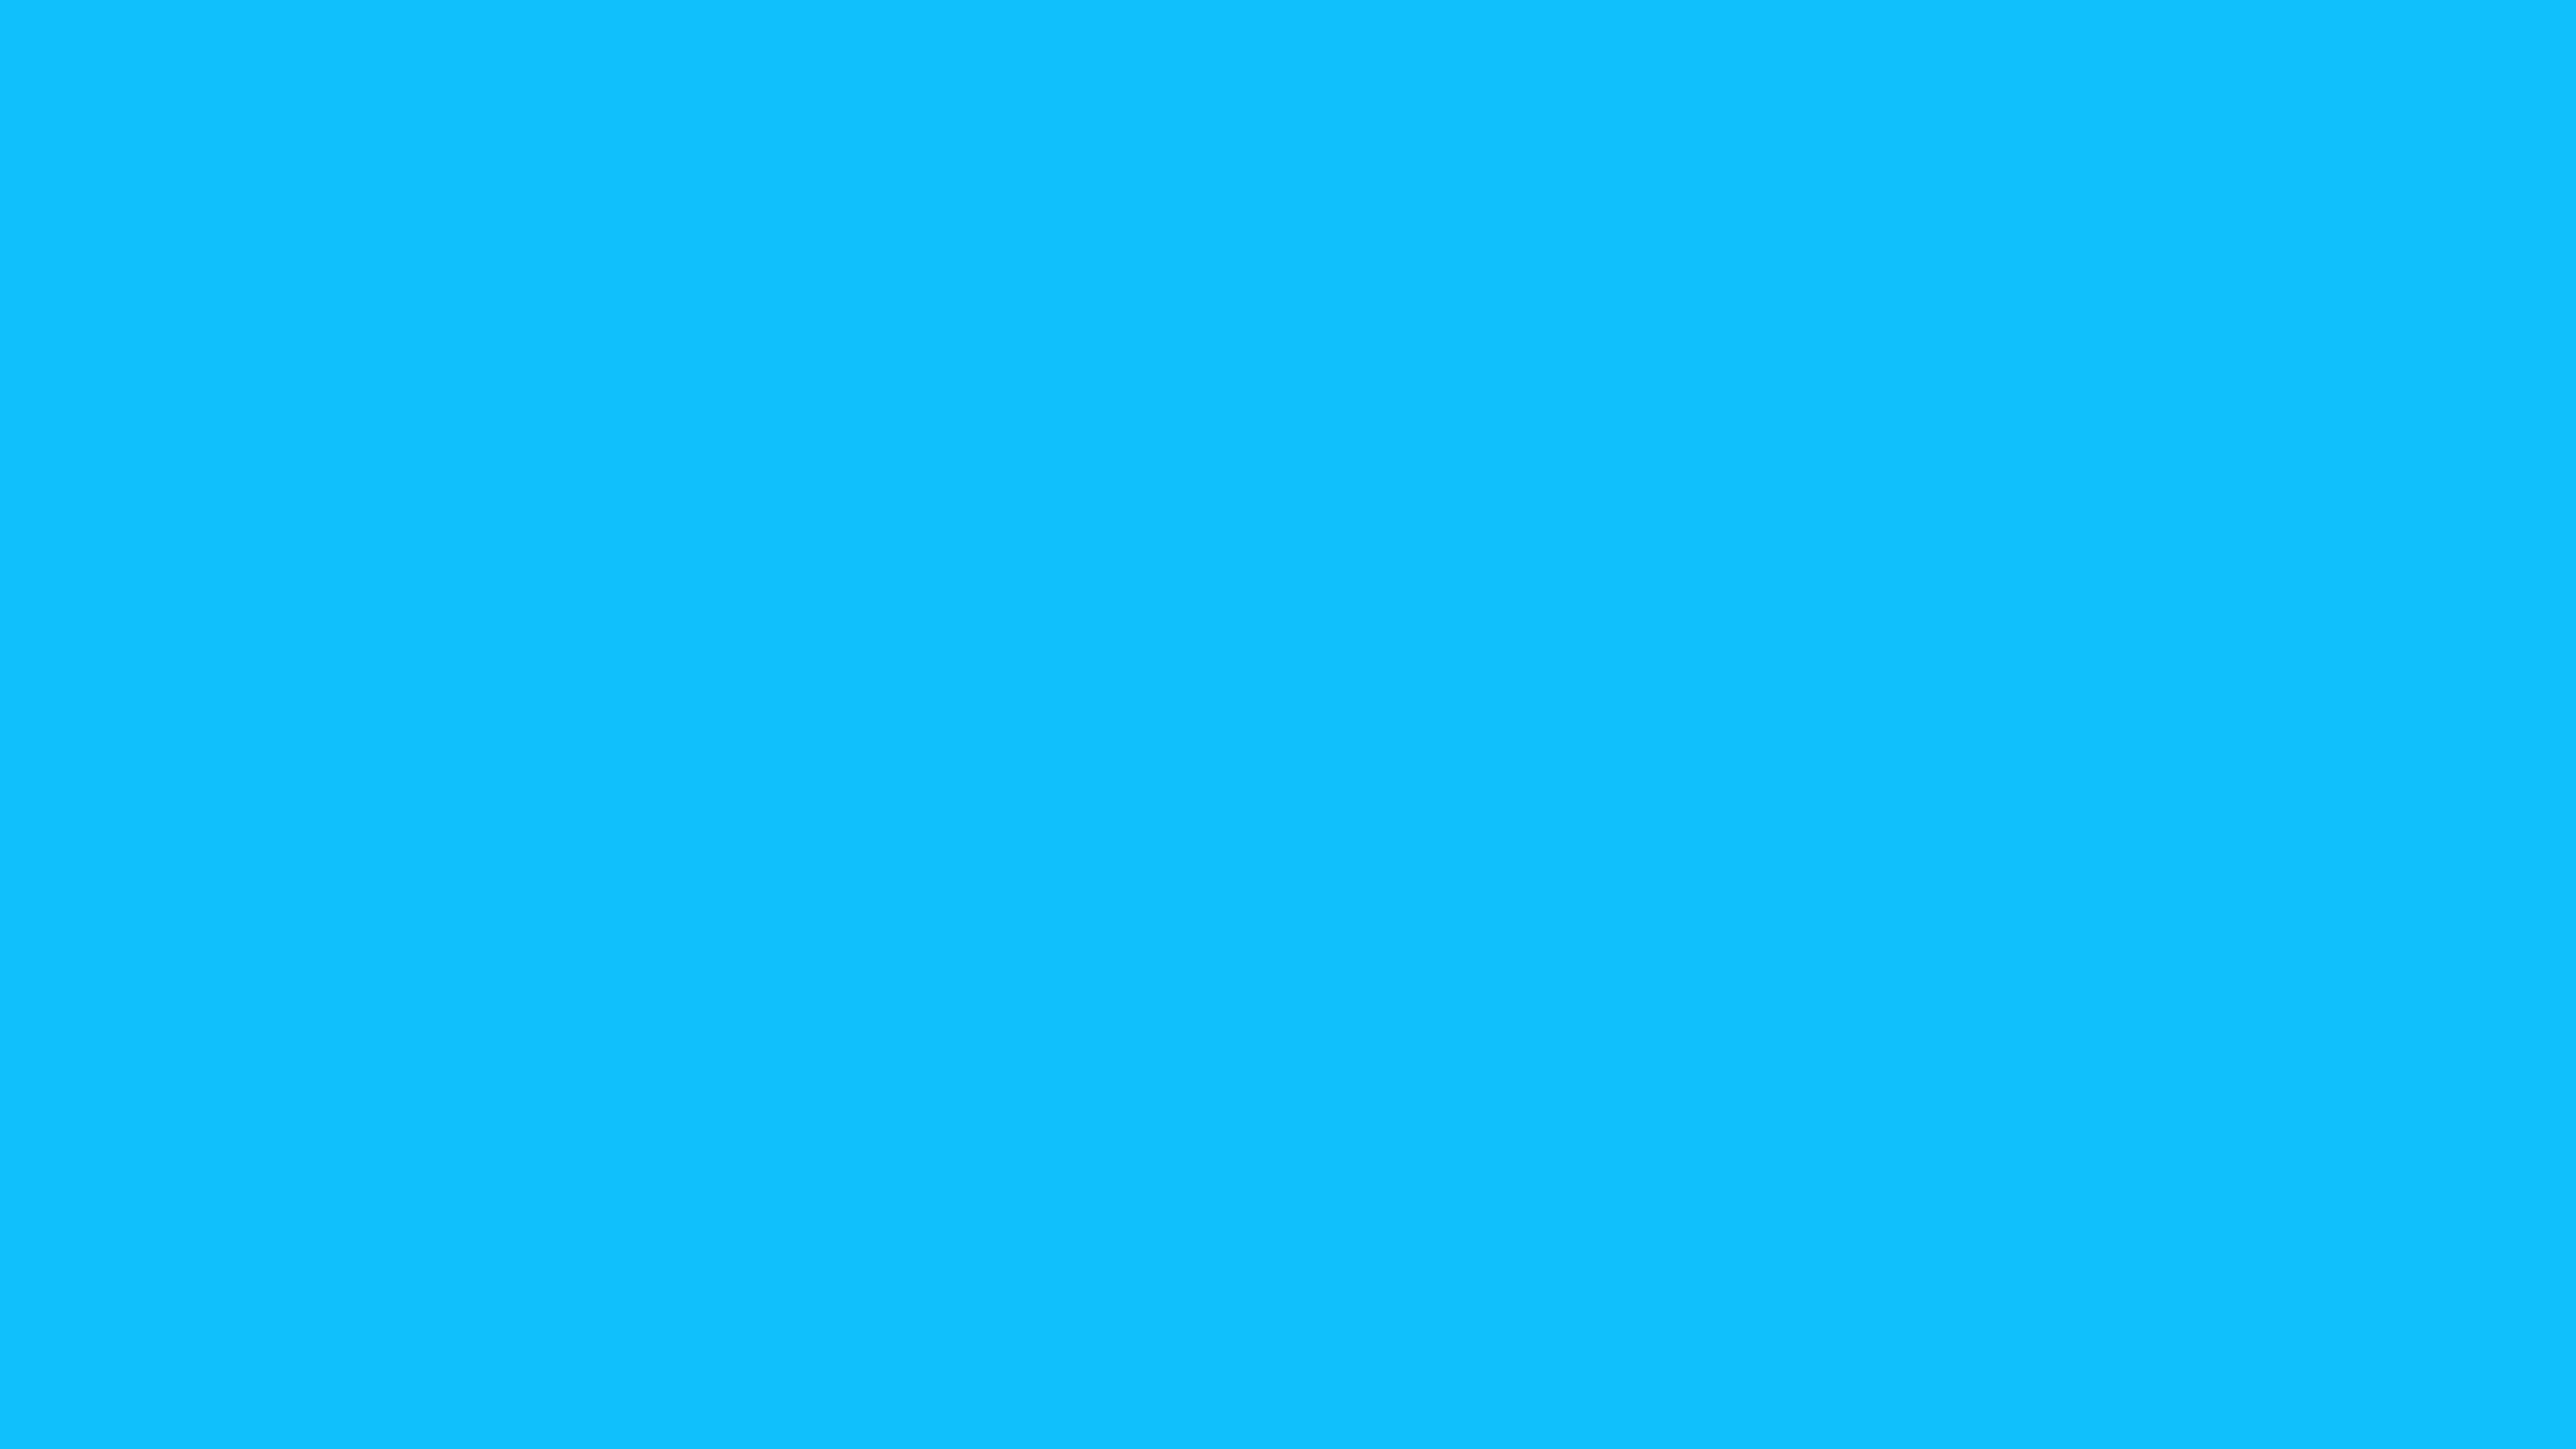 4096x2304 Spiro Disco Ball Solid Color Background